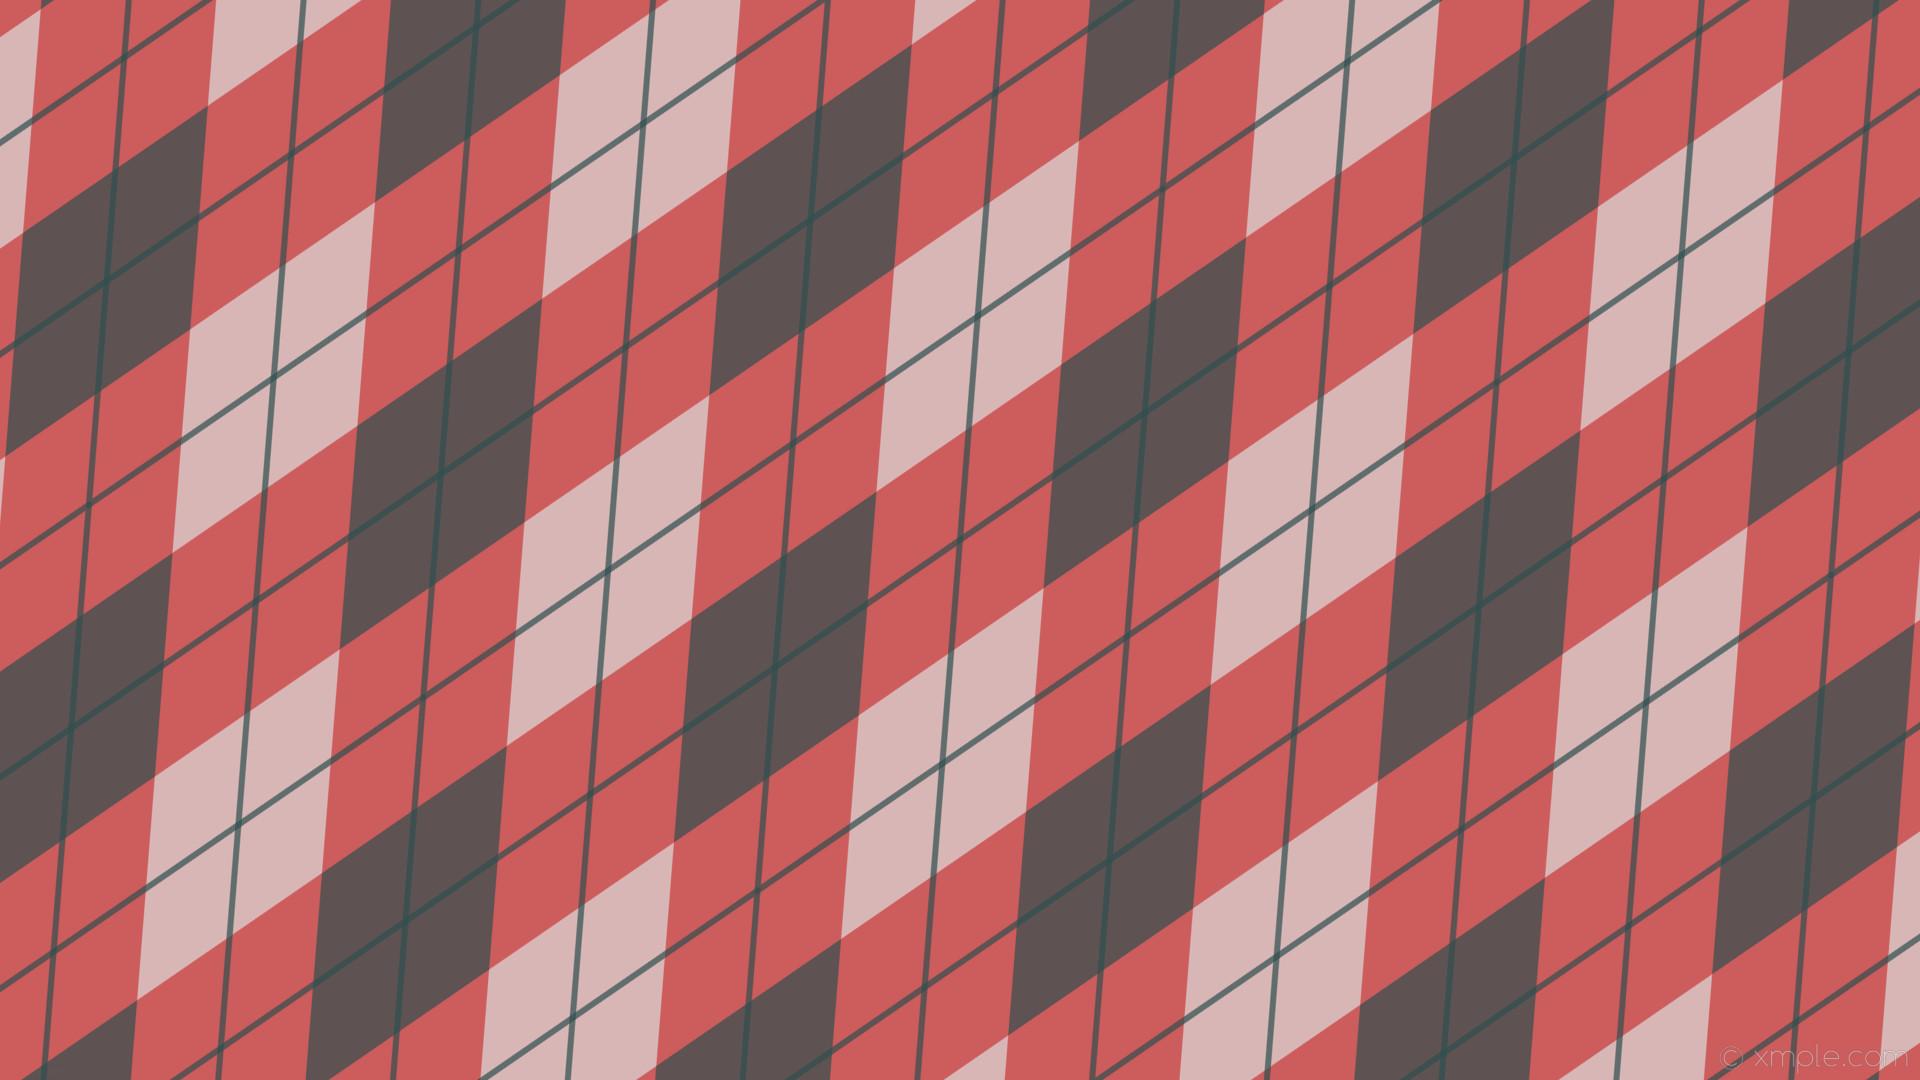 wallpaper red diamonds black grey argyle dual indian red gainsboro dark  slate gray #cd5c5c #